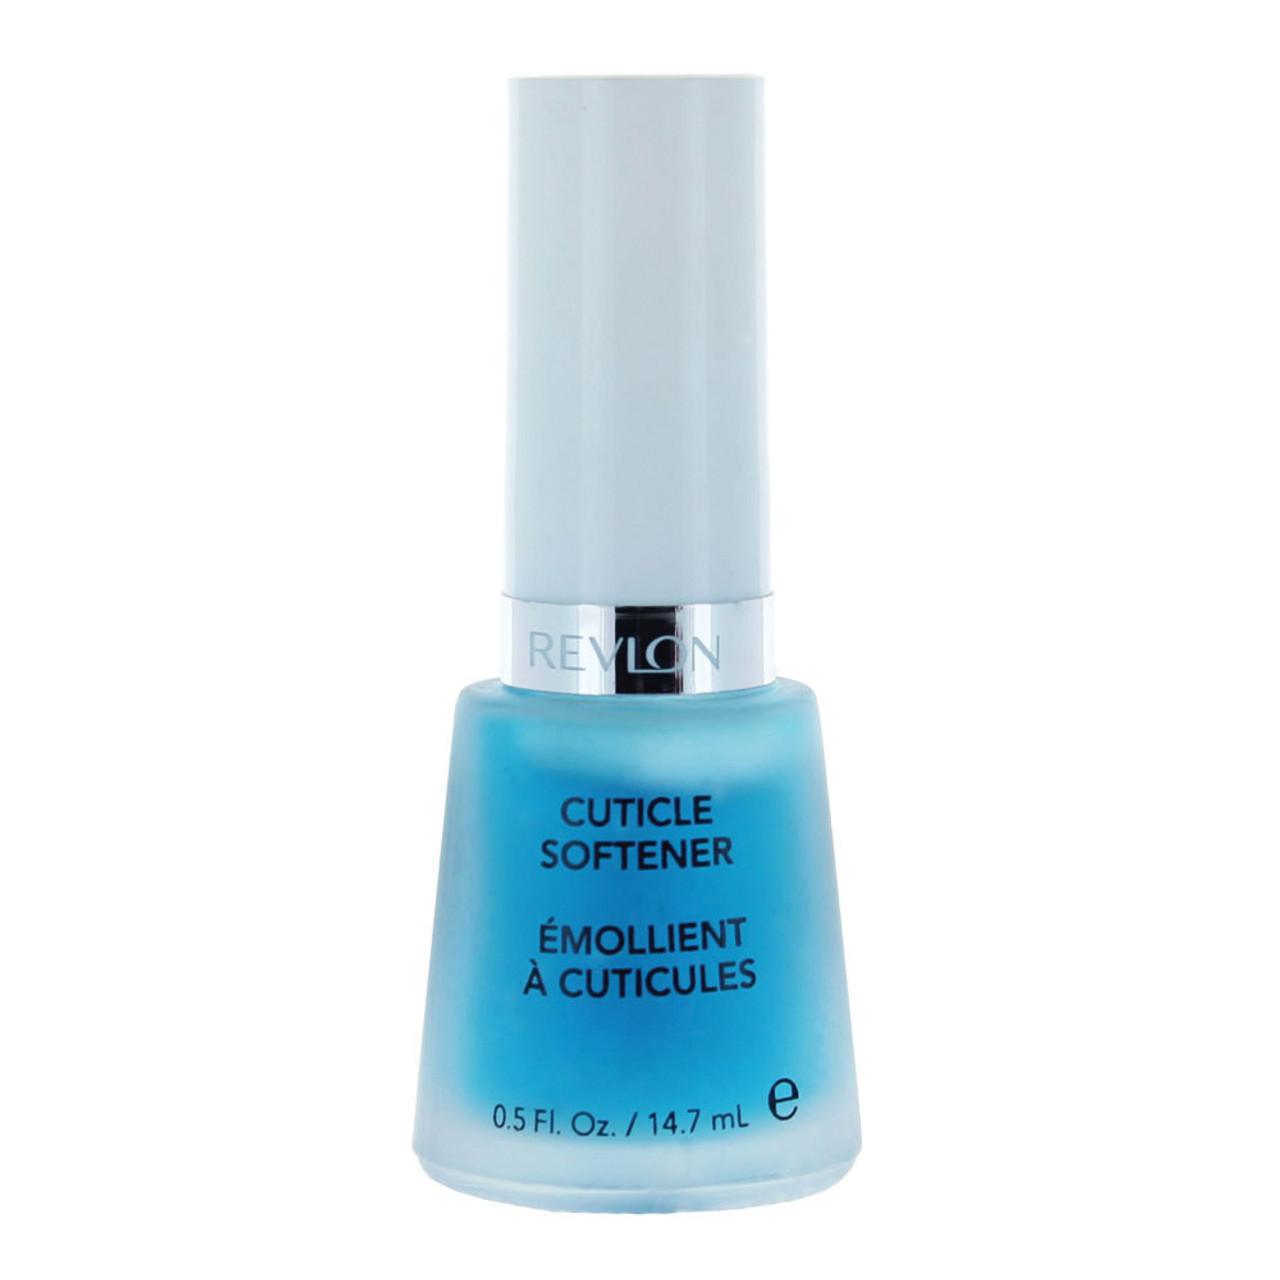 Revlon Cuticle Softener - BuyMeBeauty.com